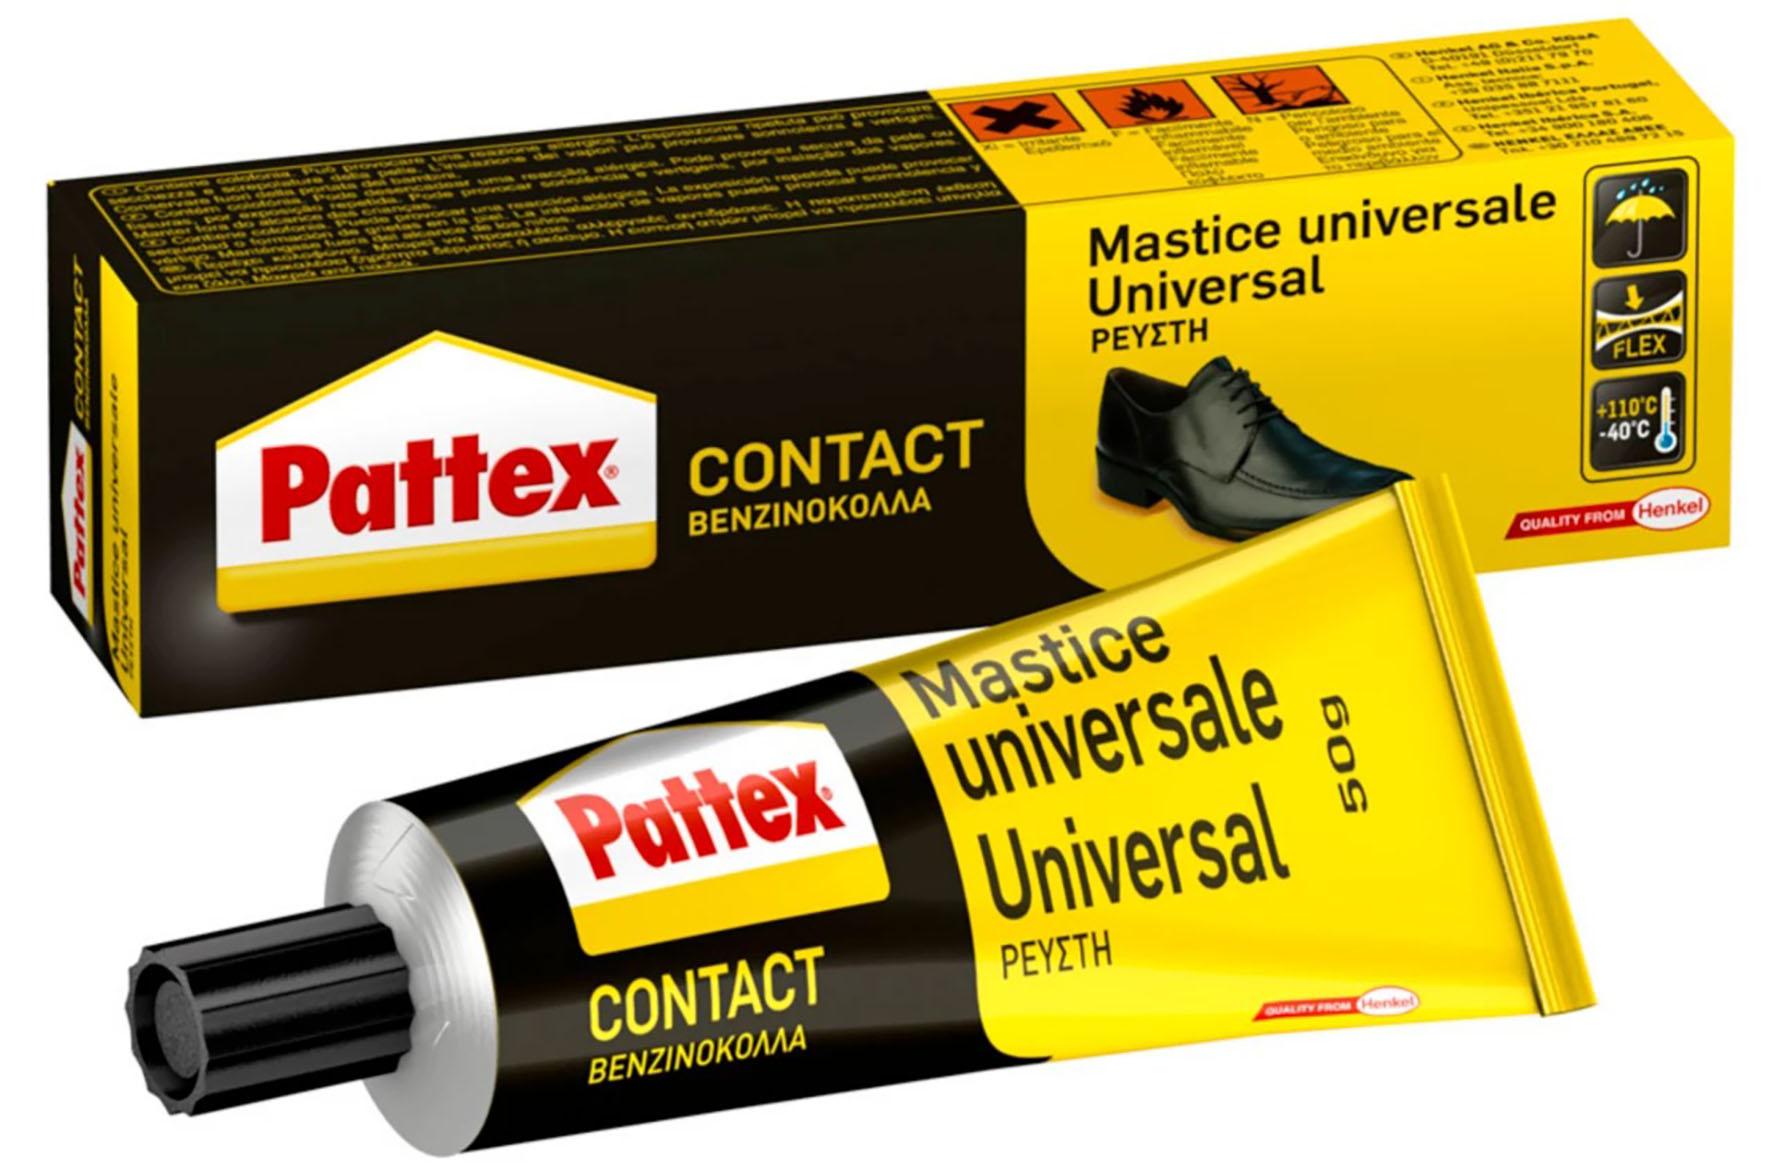 PATTEX MASTICE UNIVERSALE G 50